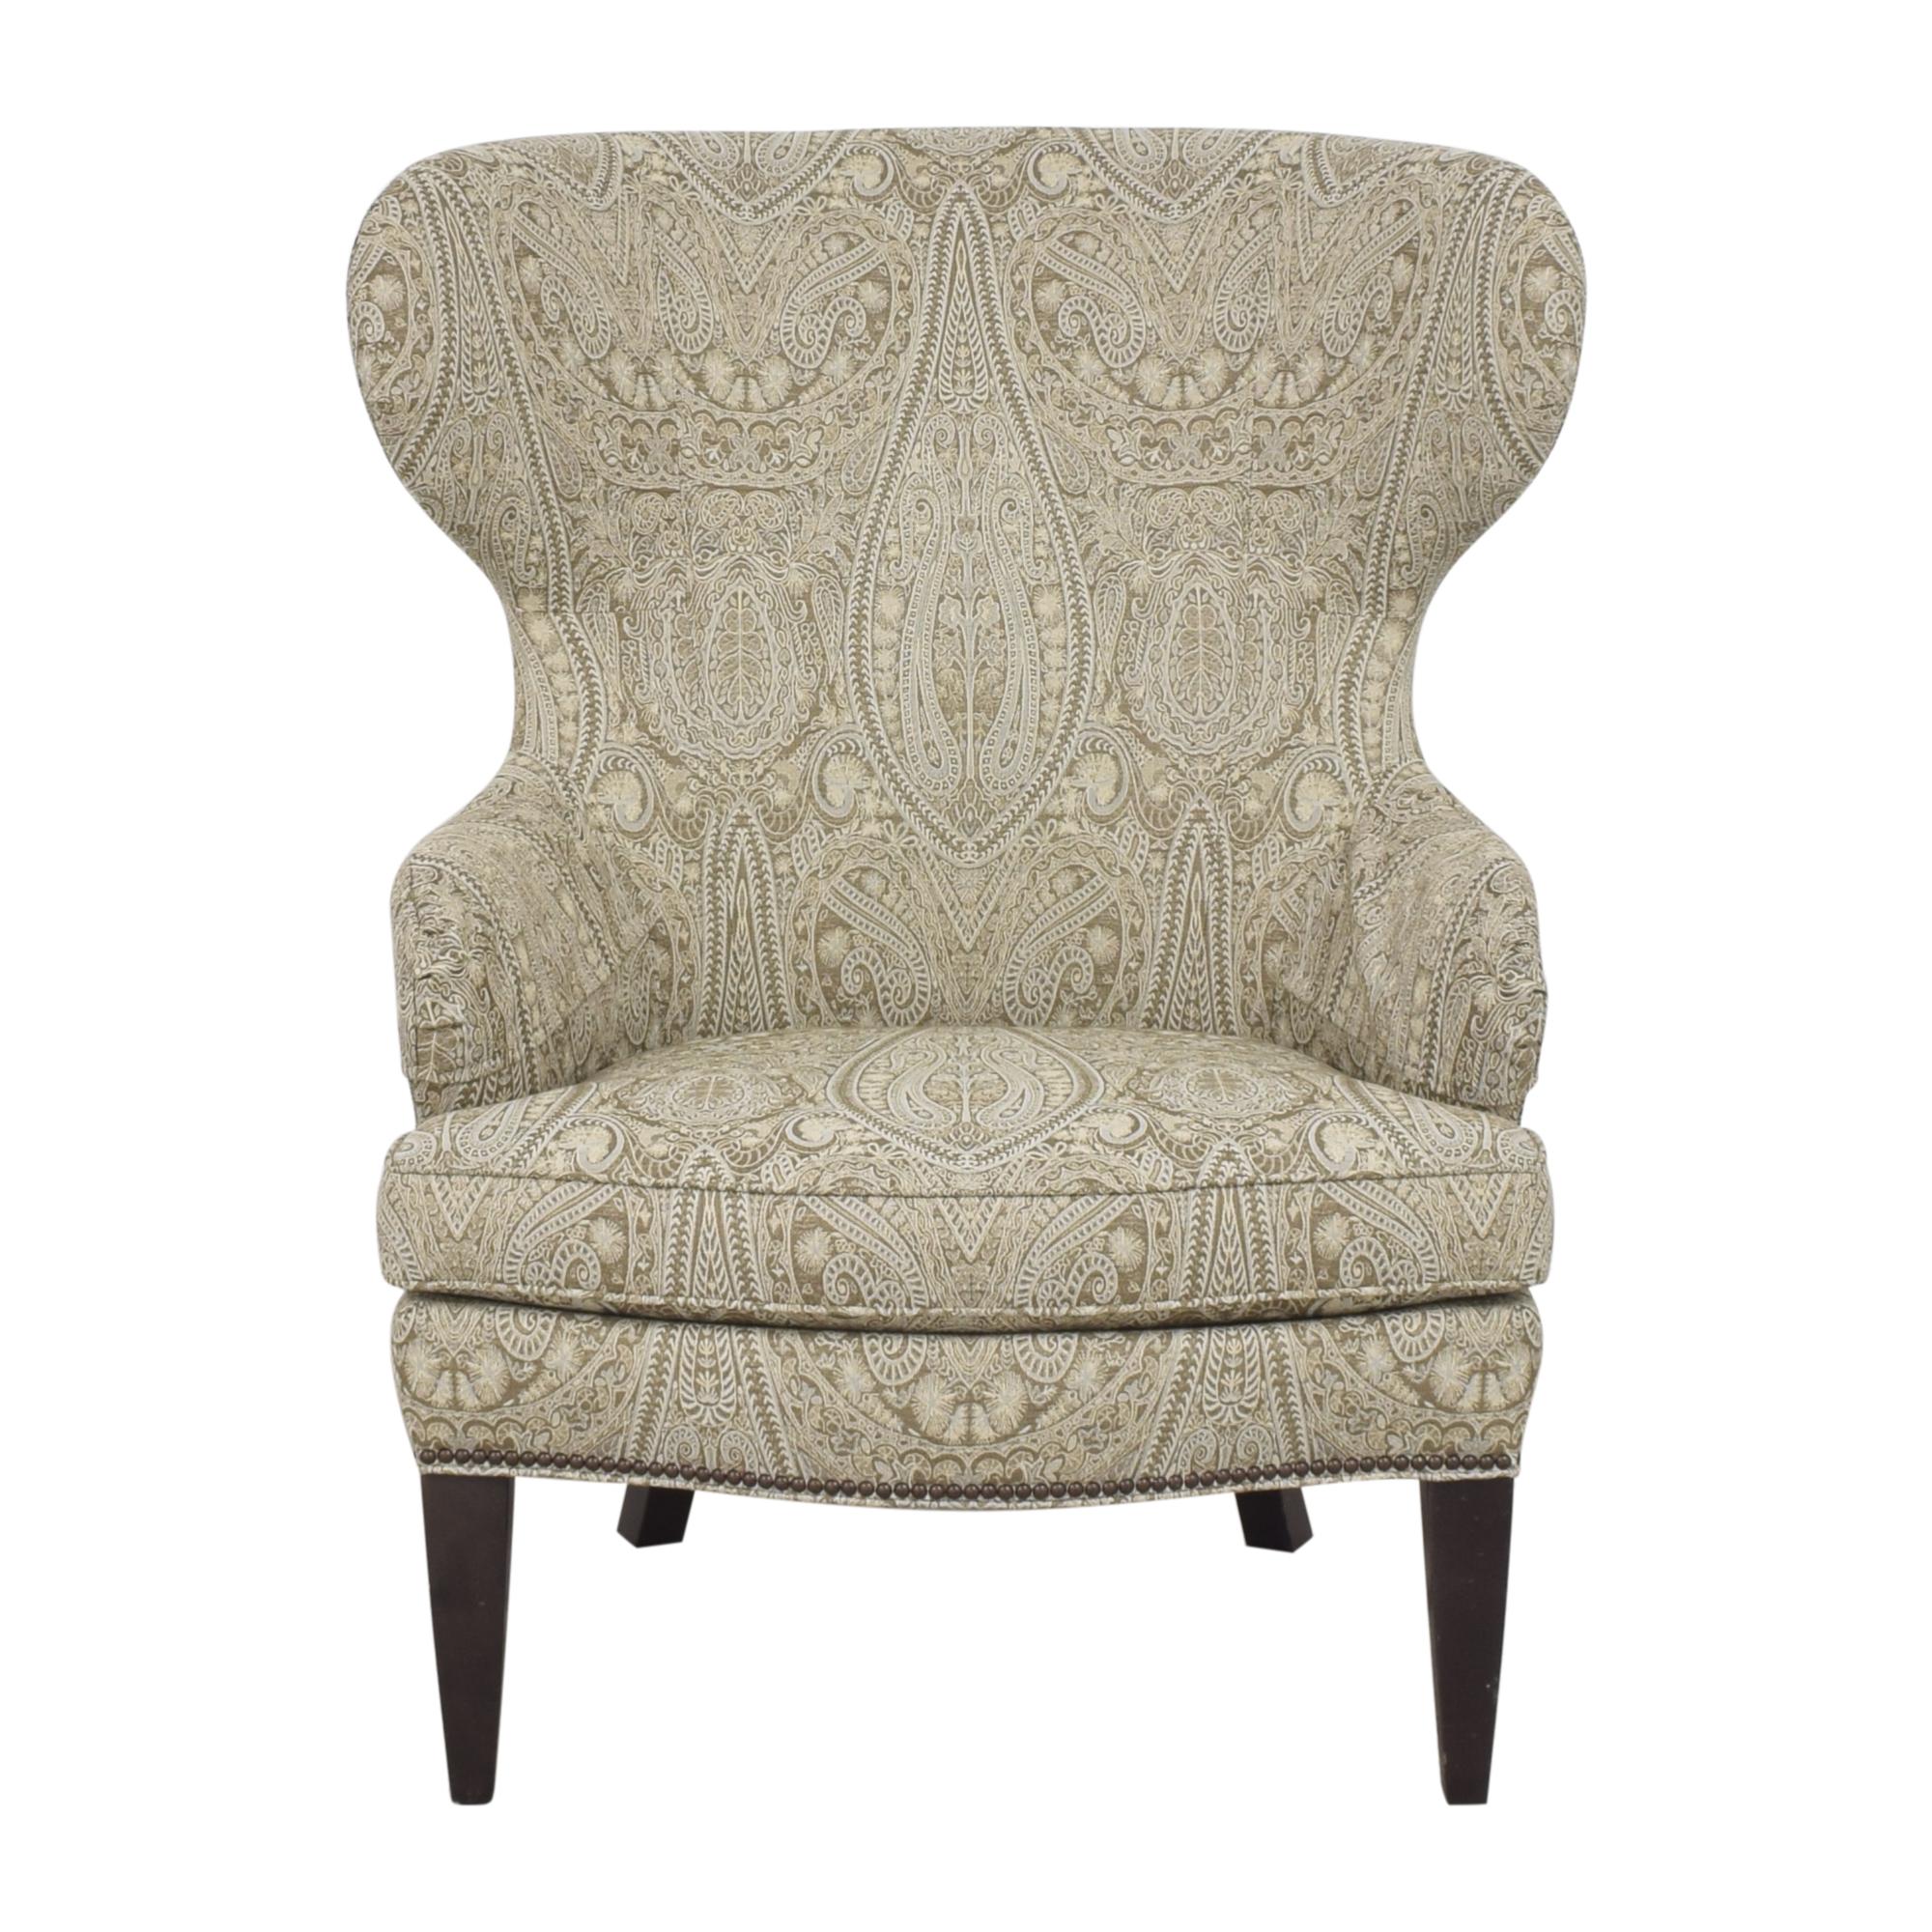 Ethan Allen Ethan Allen Rand Wing Chair nj